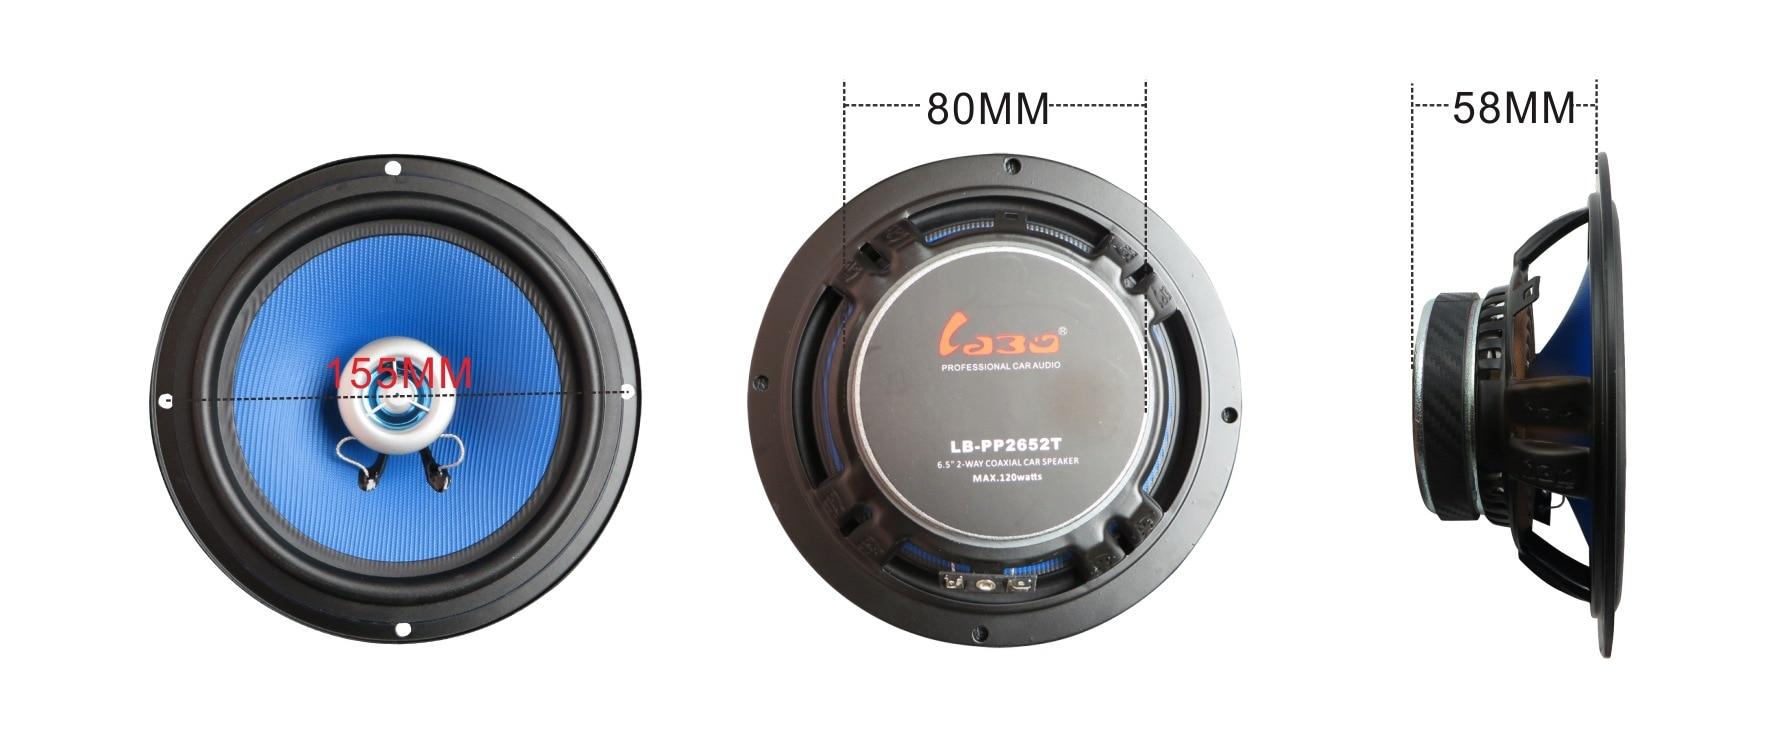 2017 auto Koaxial Horn Subwoofer 6,5 Zoll Auto Audio Lautsprecher ...